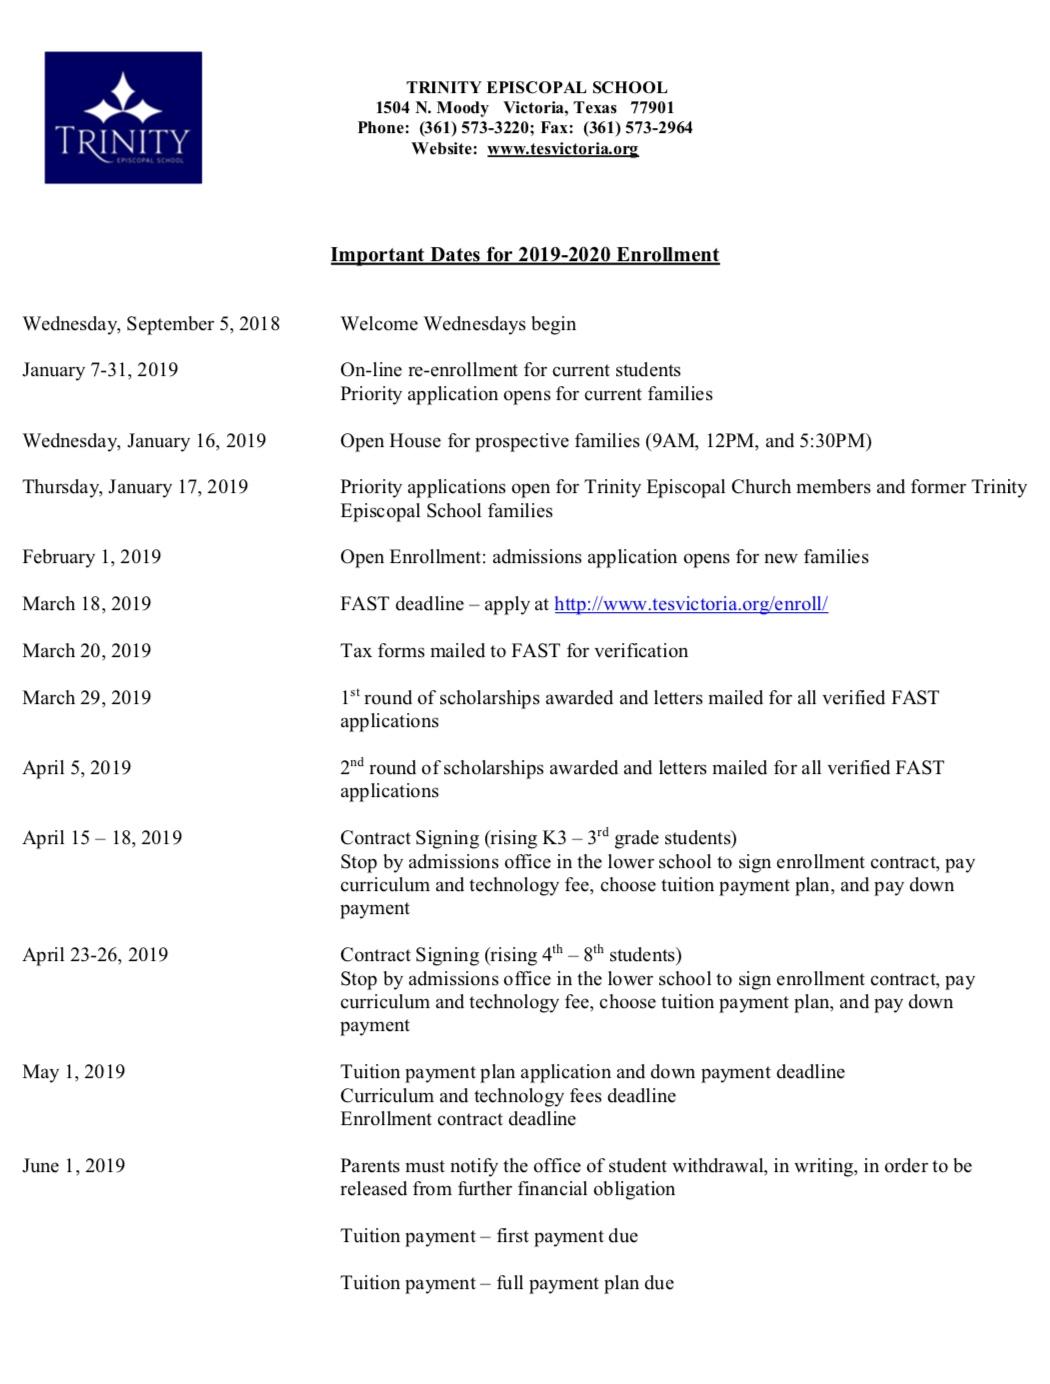 Admissions Timeline - Trinity Episcopal School